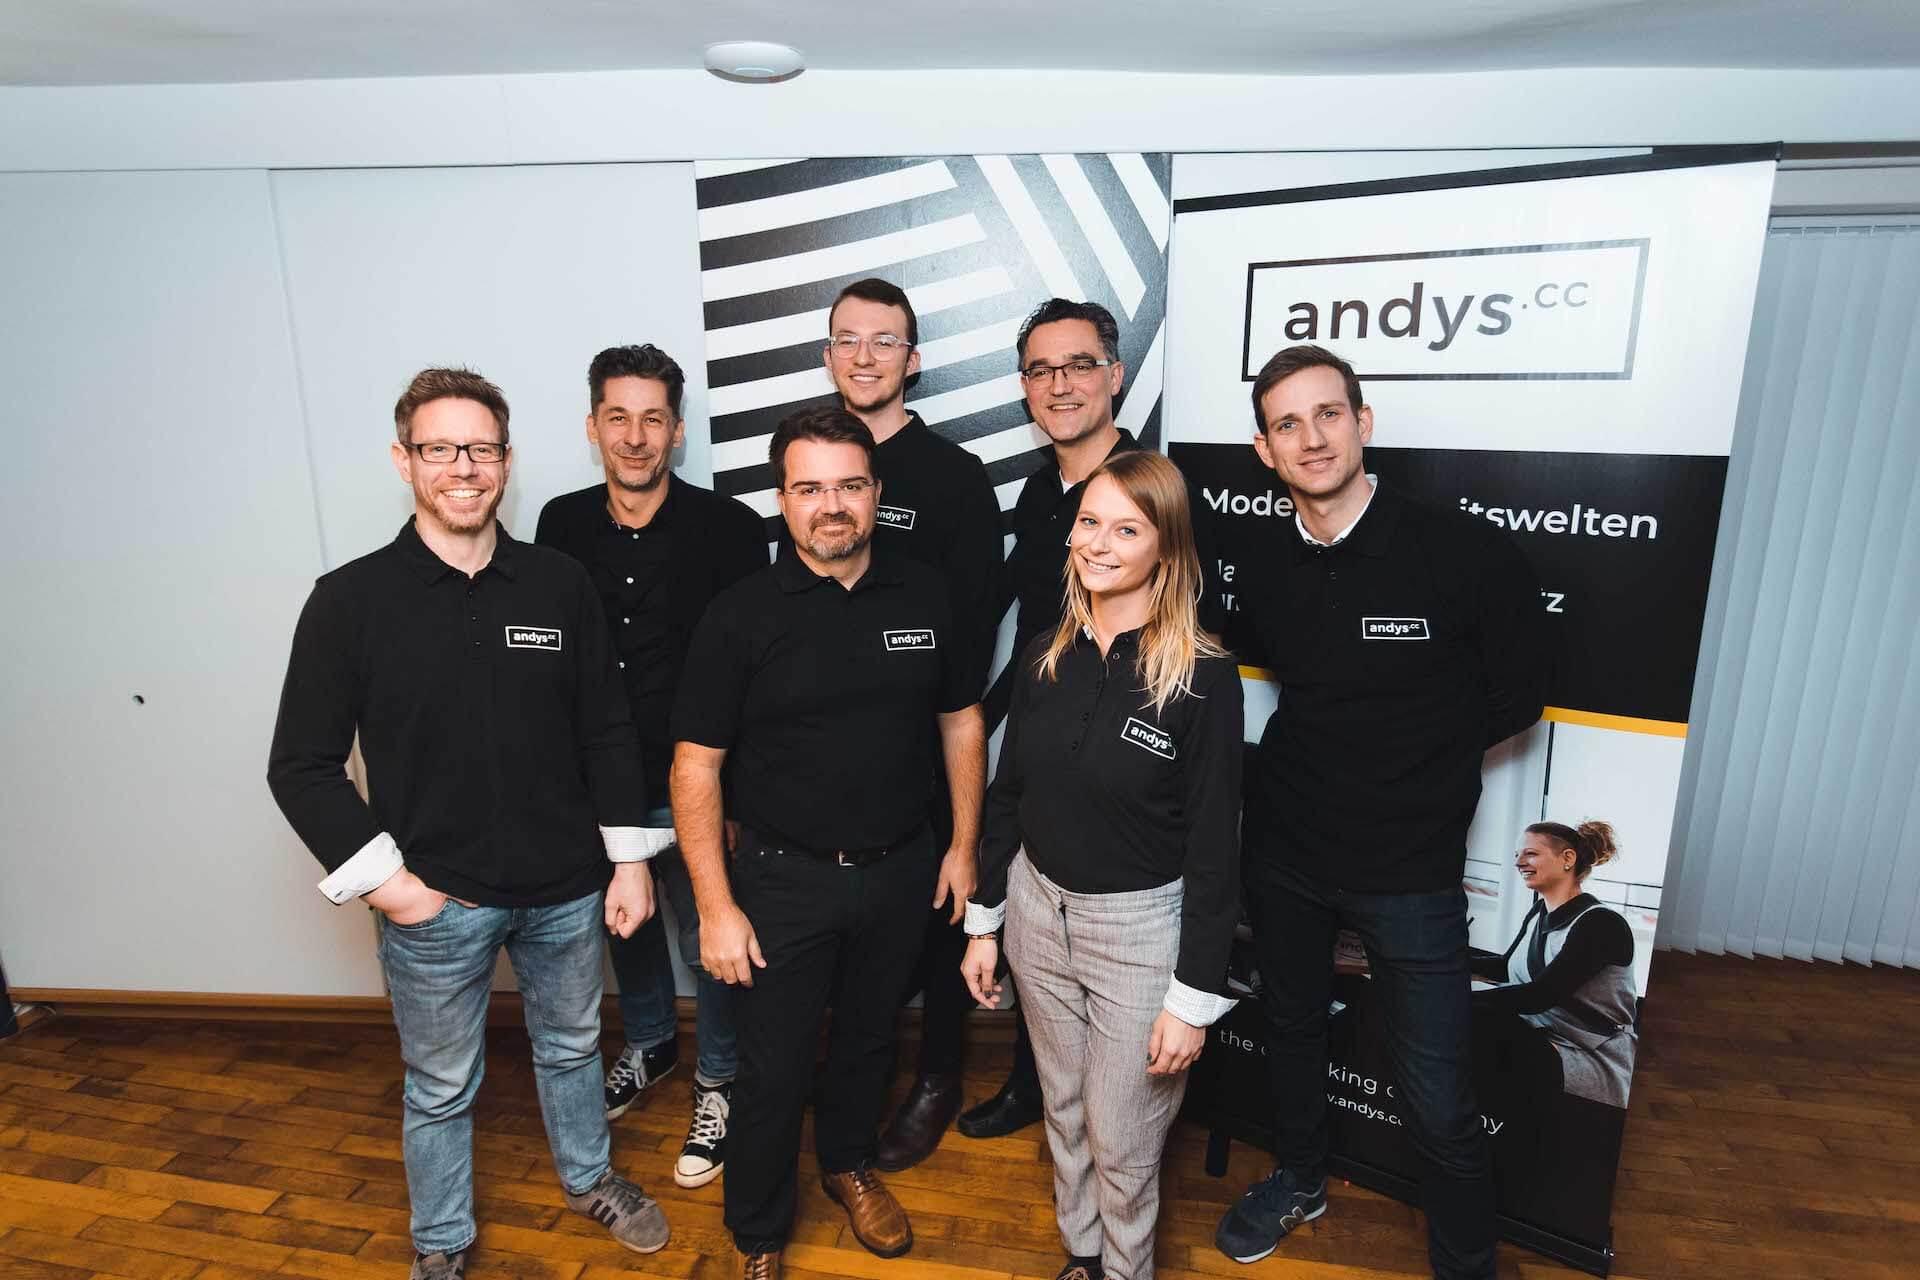 Andyscc Team